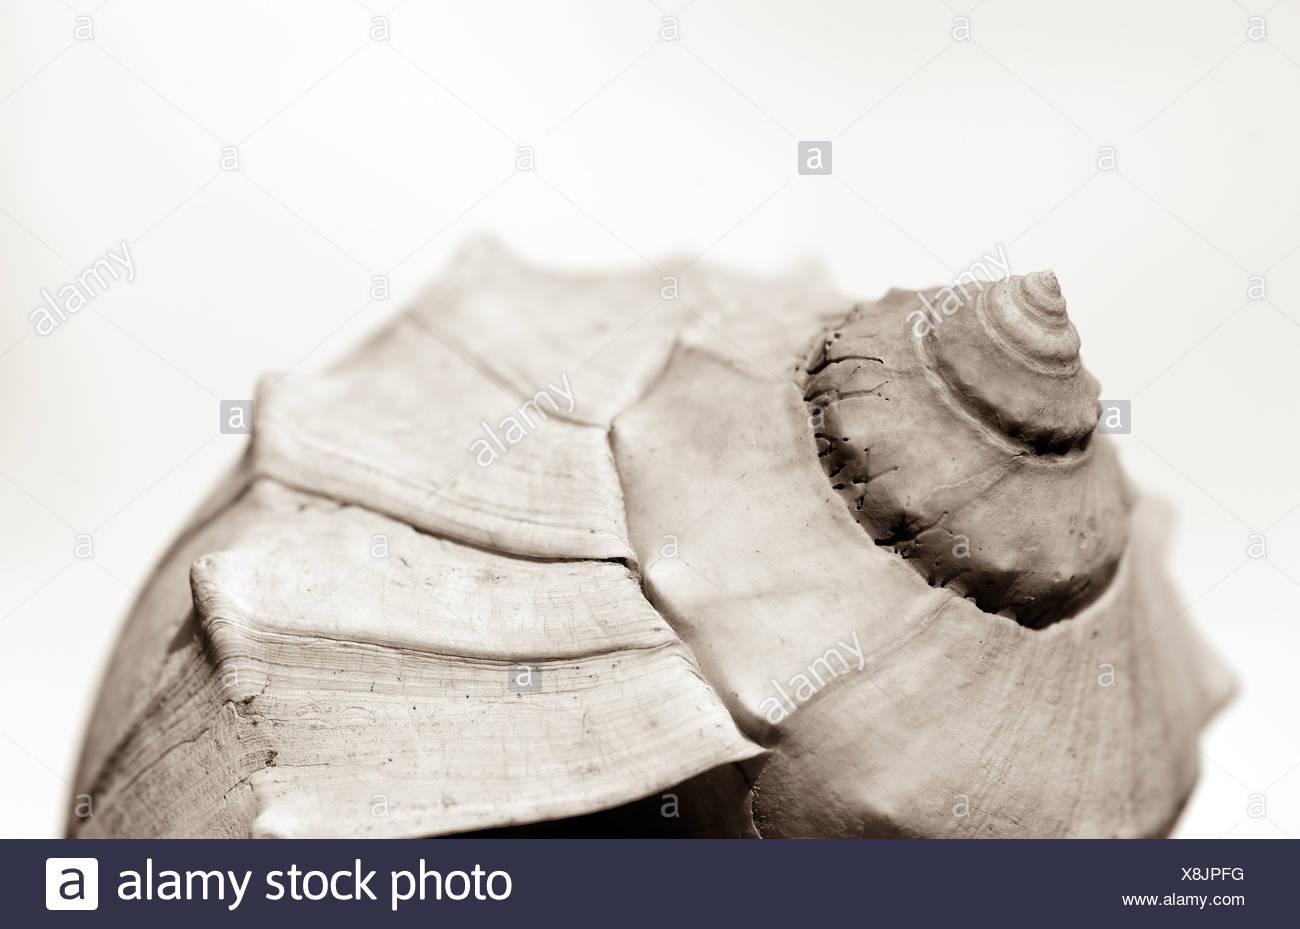 Conchas de moluscos Imagen De Stock